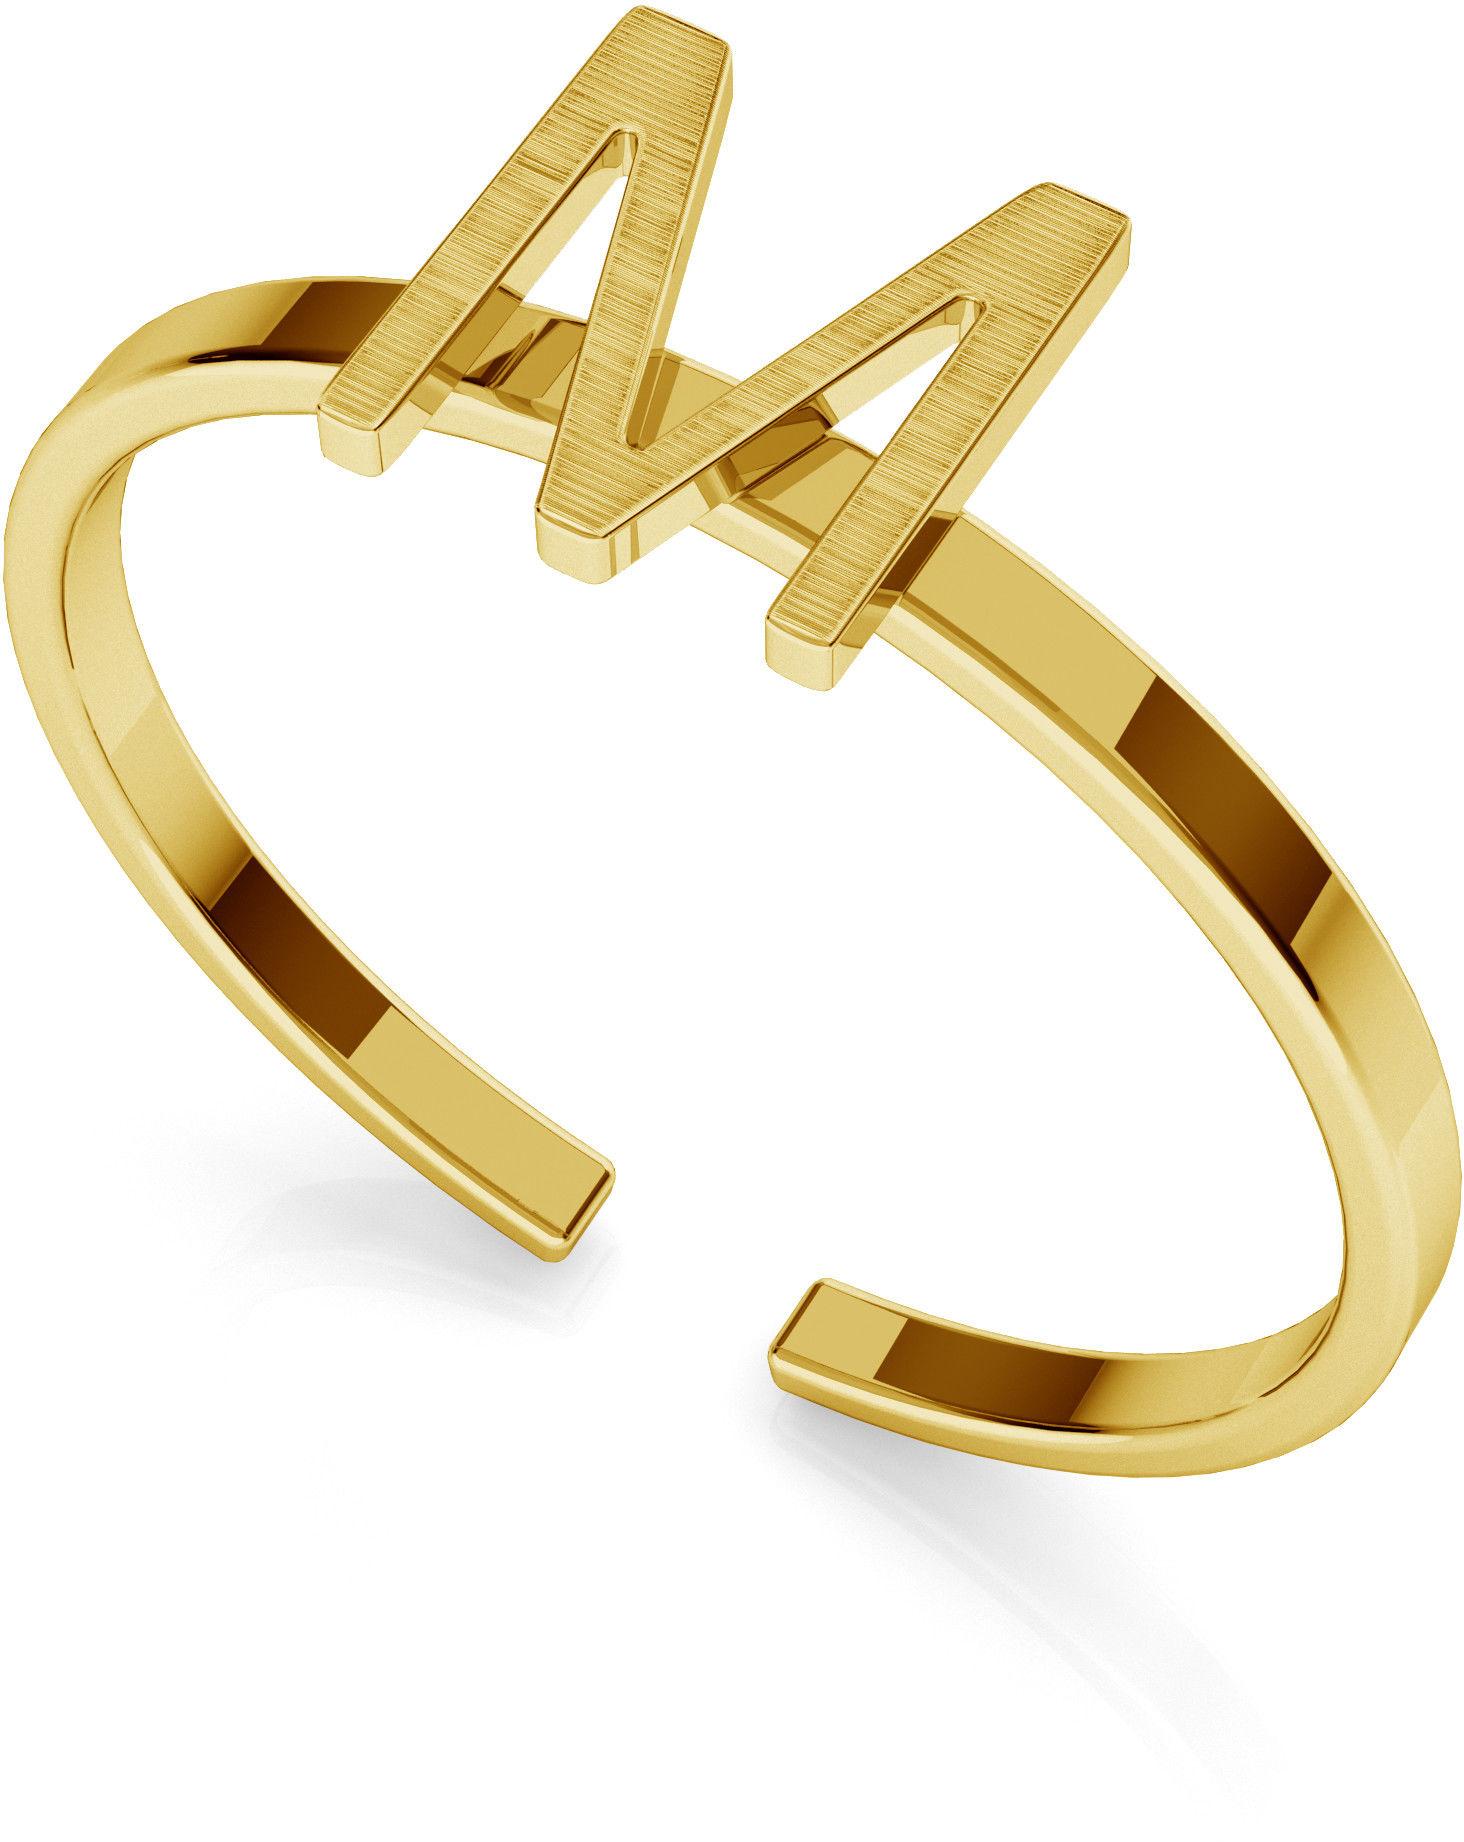 Srebrny pierścionek z literką My RING, srebro 925 : Litera - O, Srebro - kolor pokrycia - Pokrycie platyną